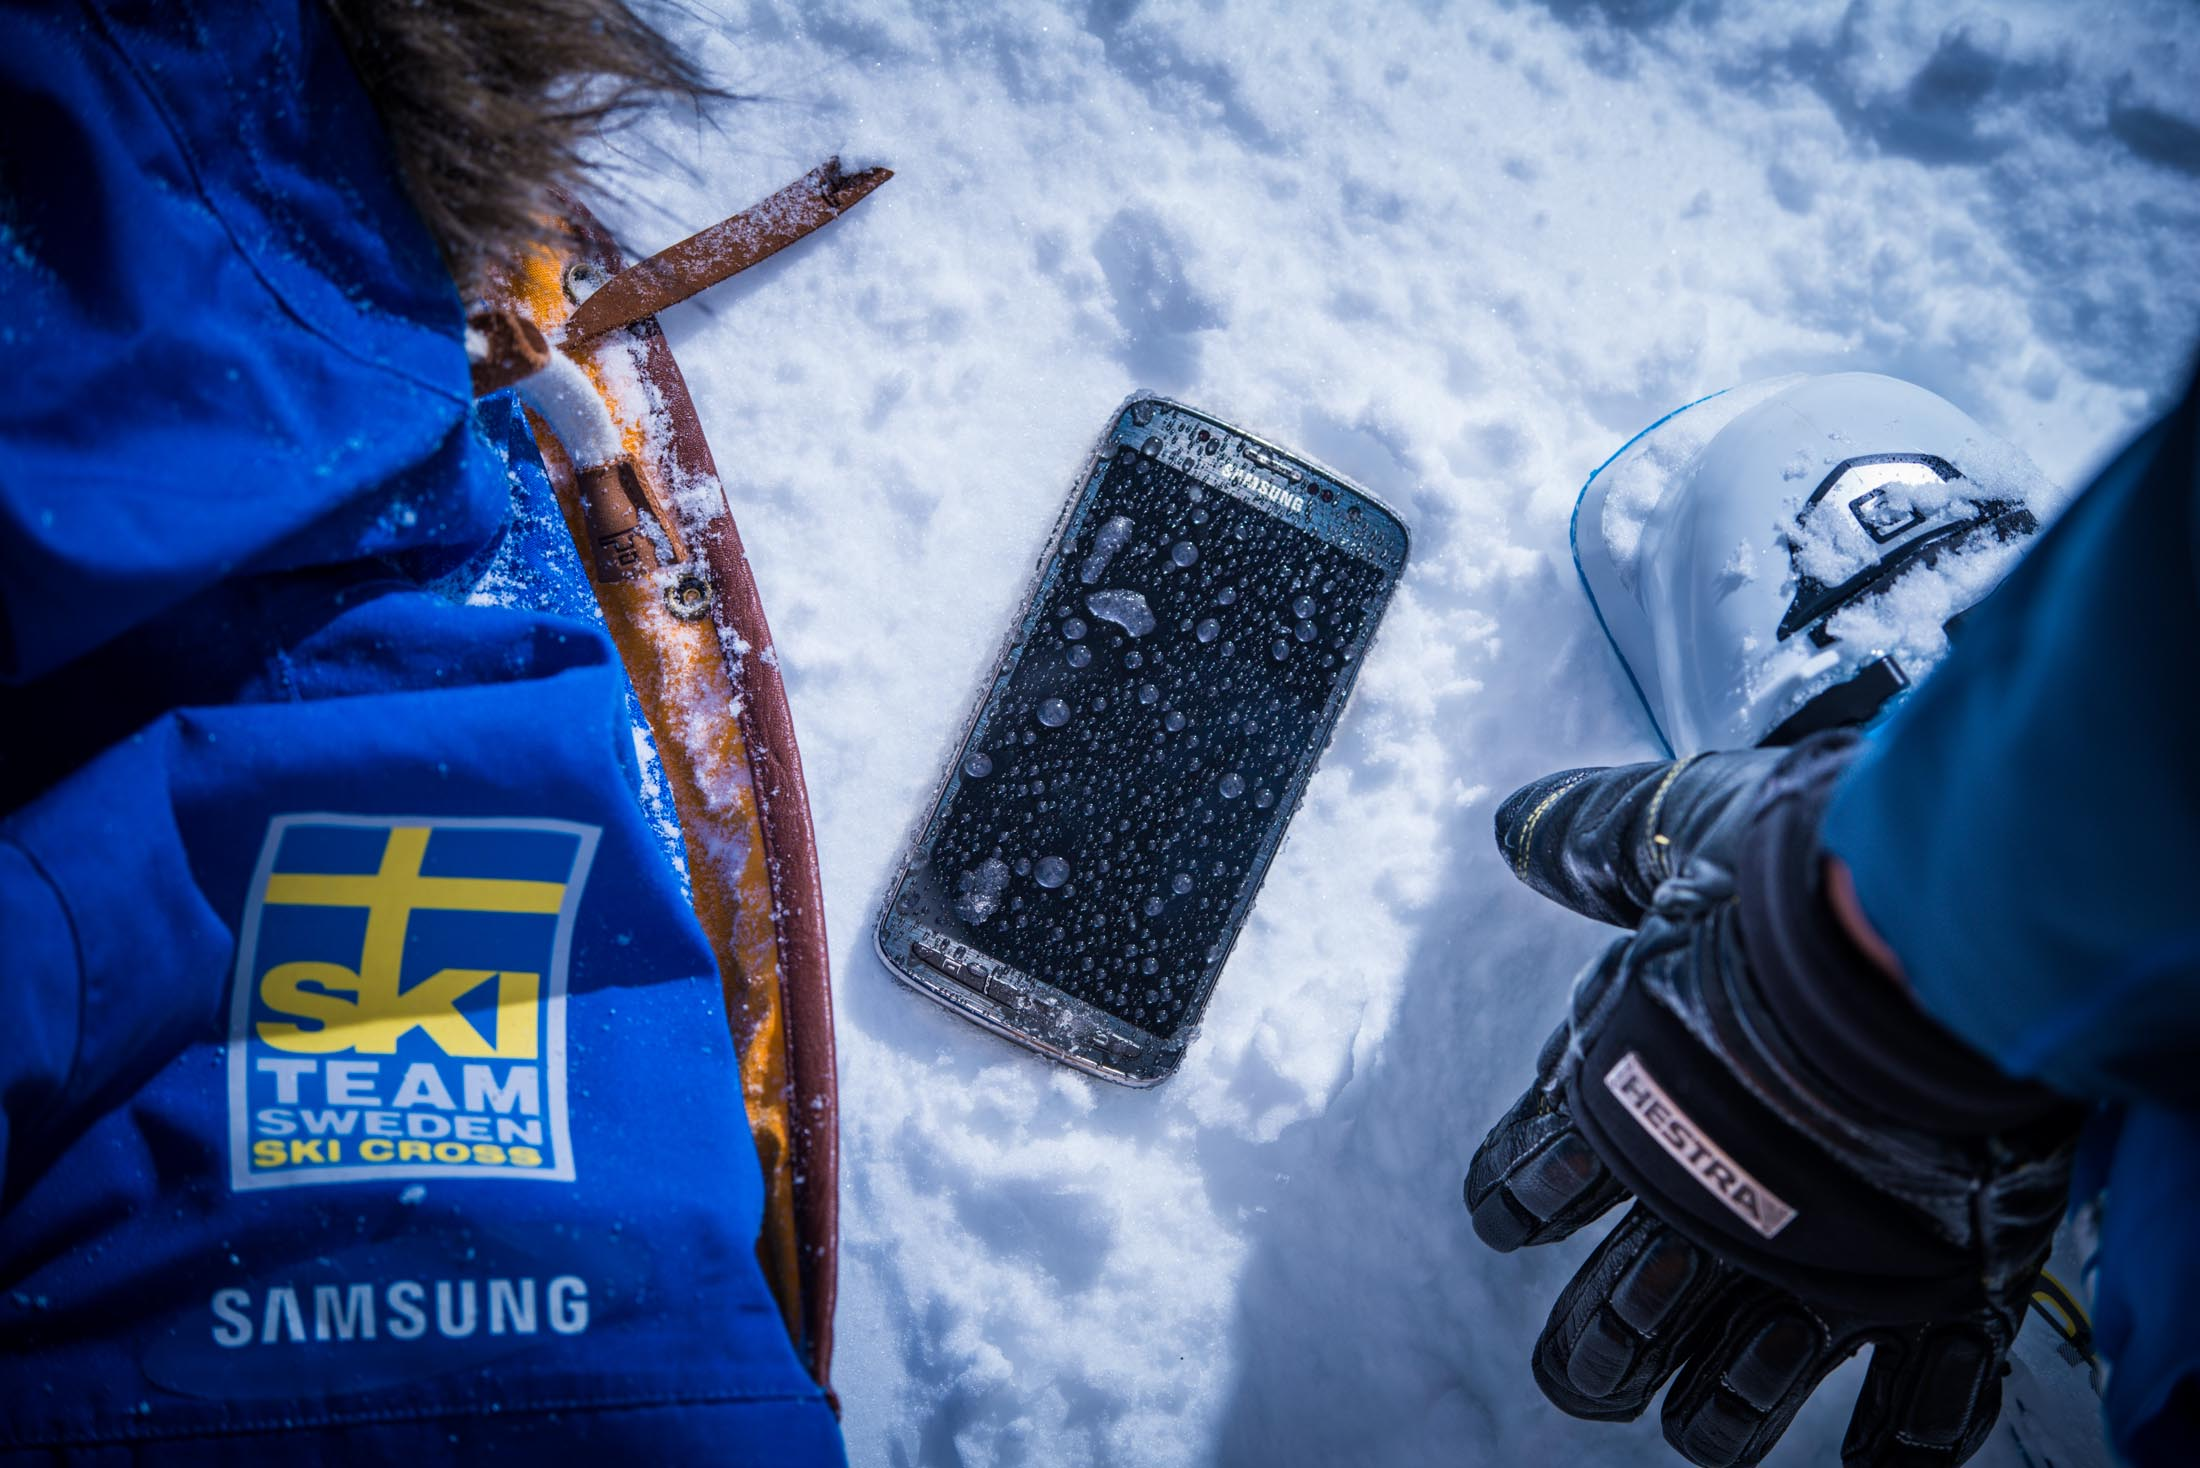 SKI TEAM SKICROSS SWEDEN - Officiella partnerbilder till skicrosslandslaget.